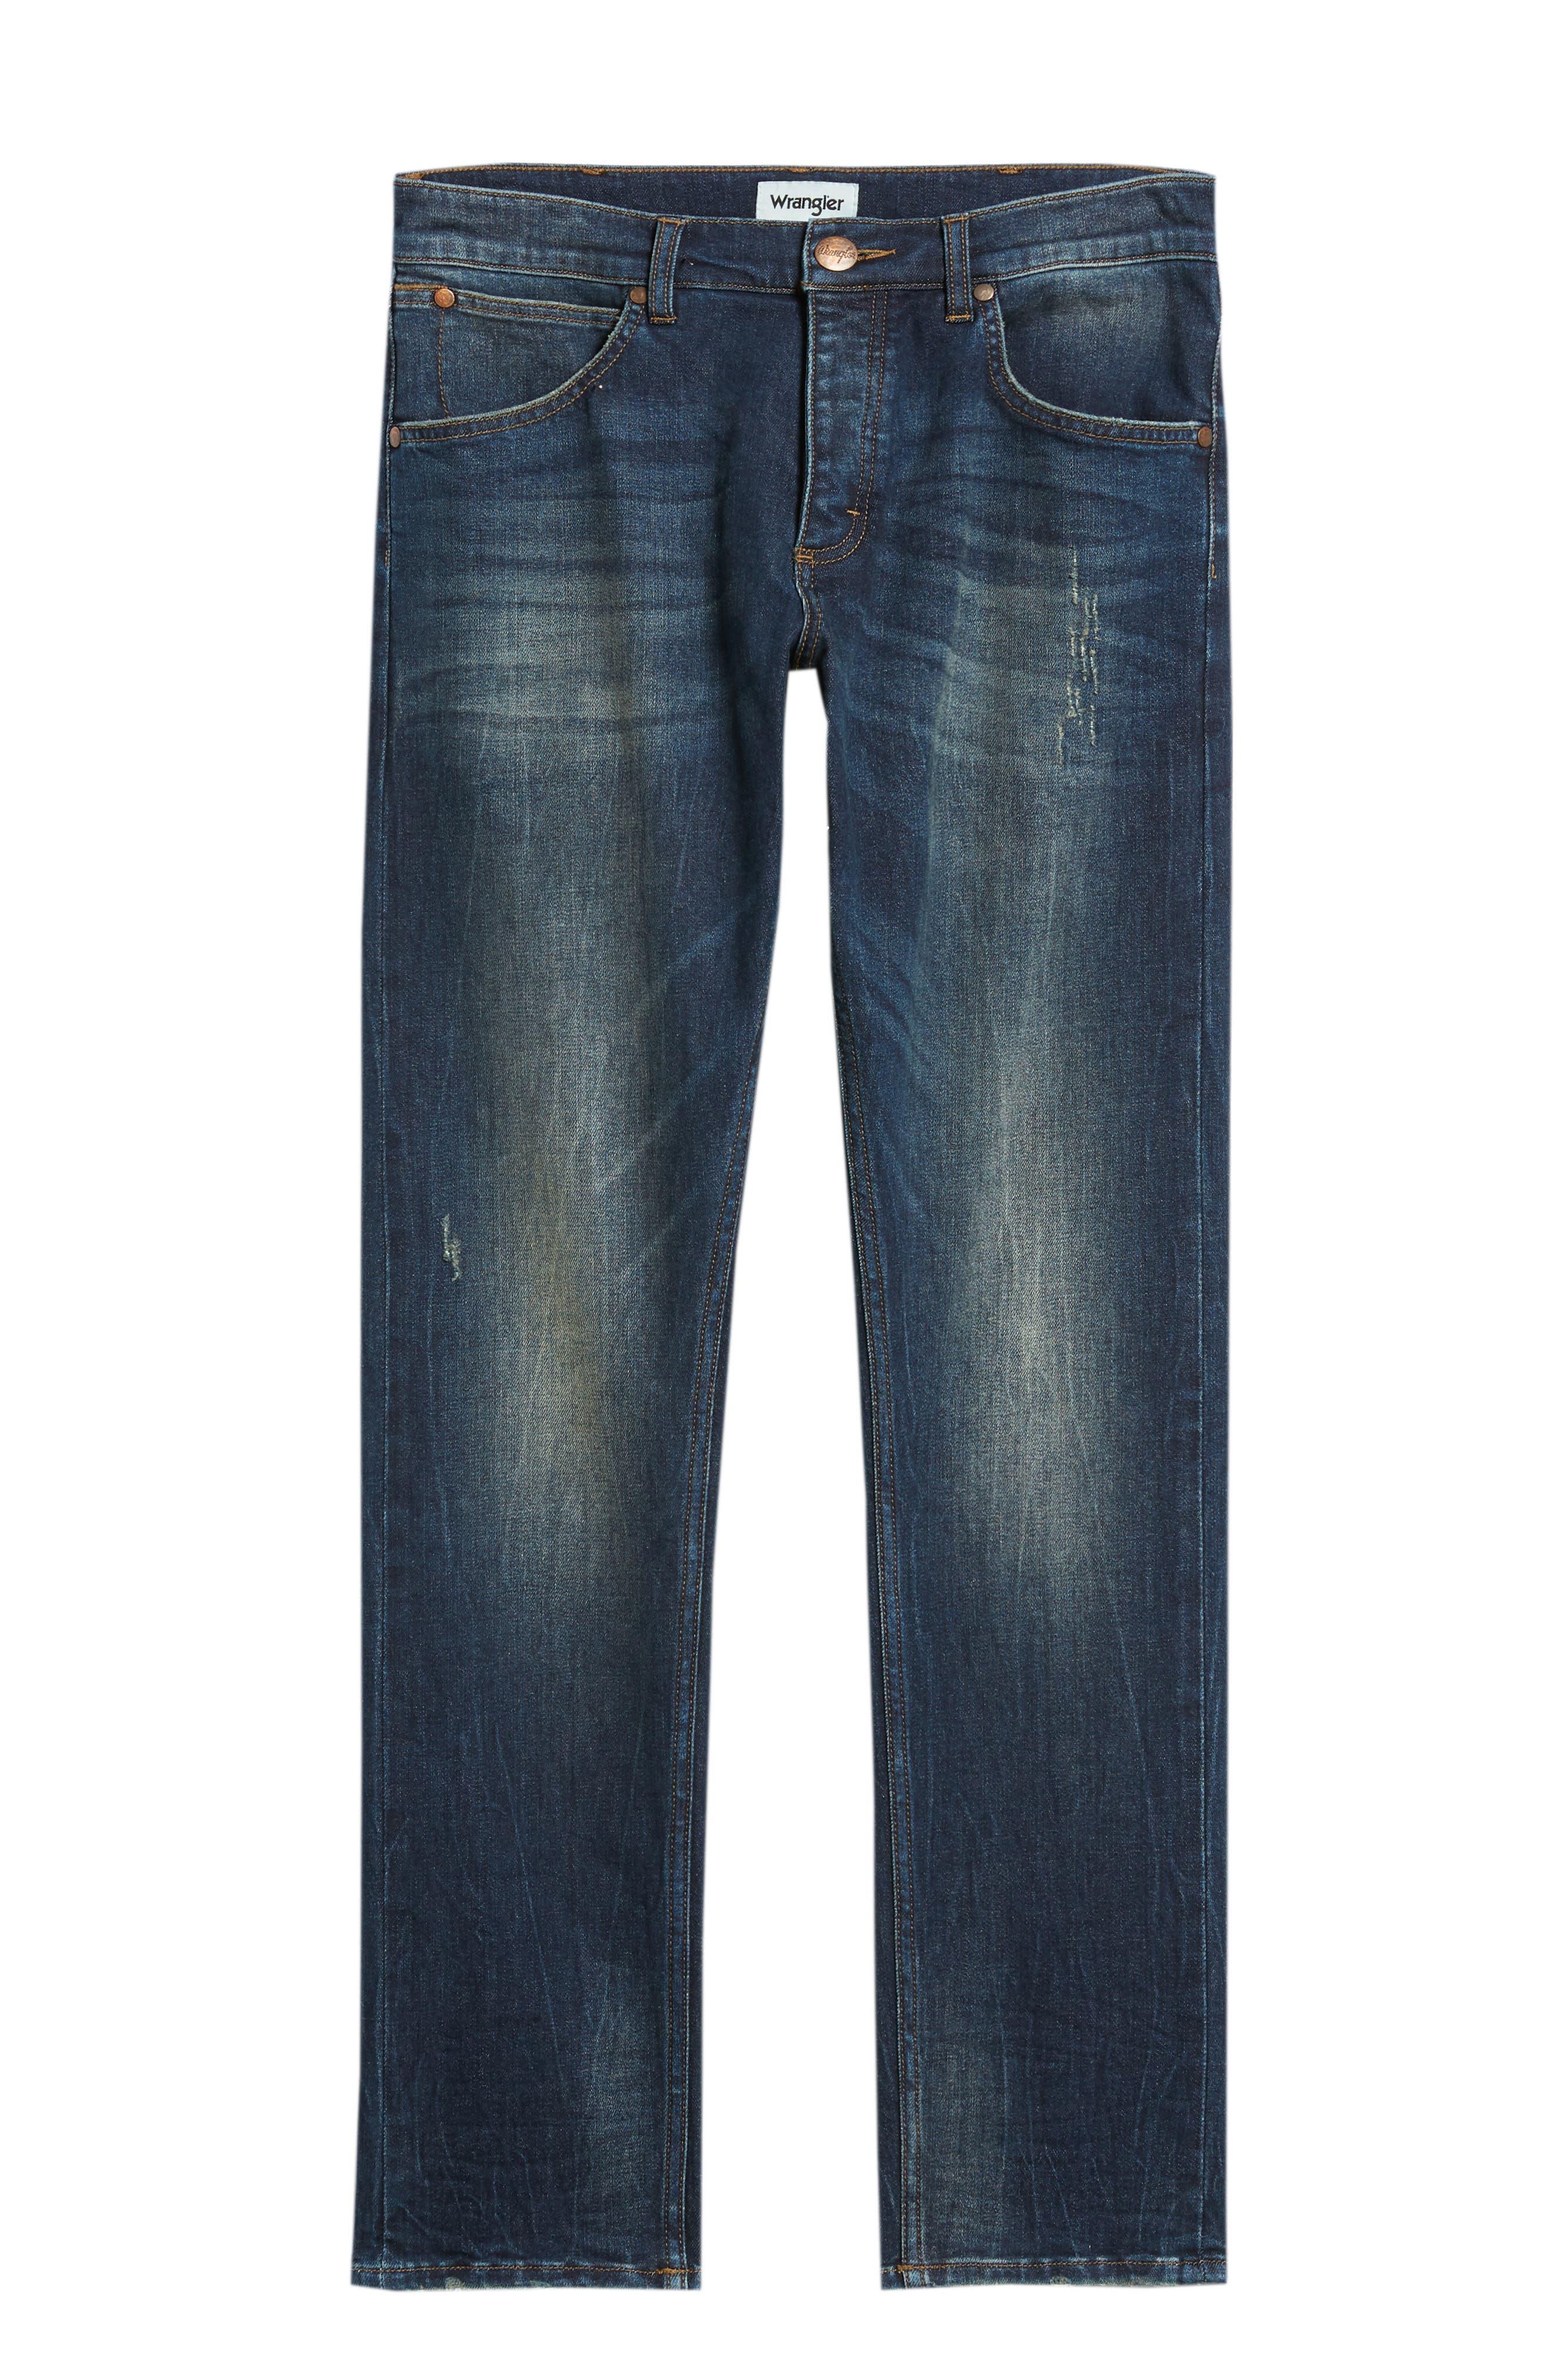 Larston Slim Fit Jeans,                             Alternate thumbnail 6, color,                             VINTAGE DARK